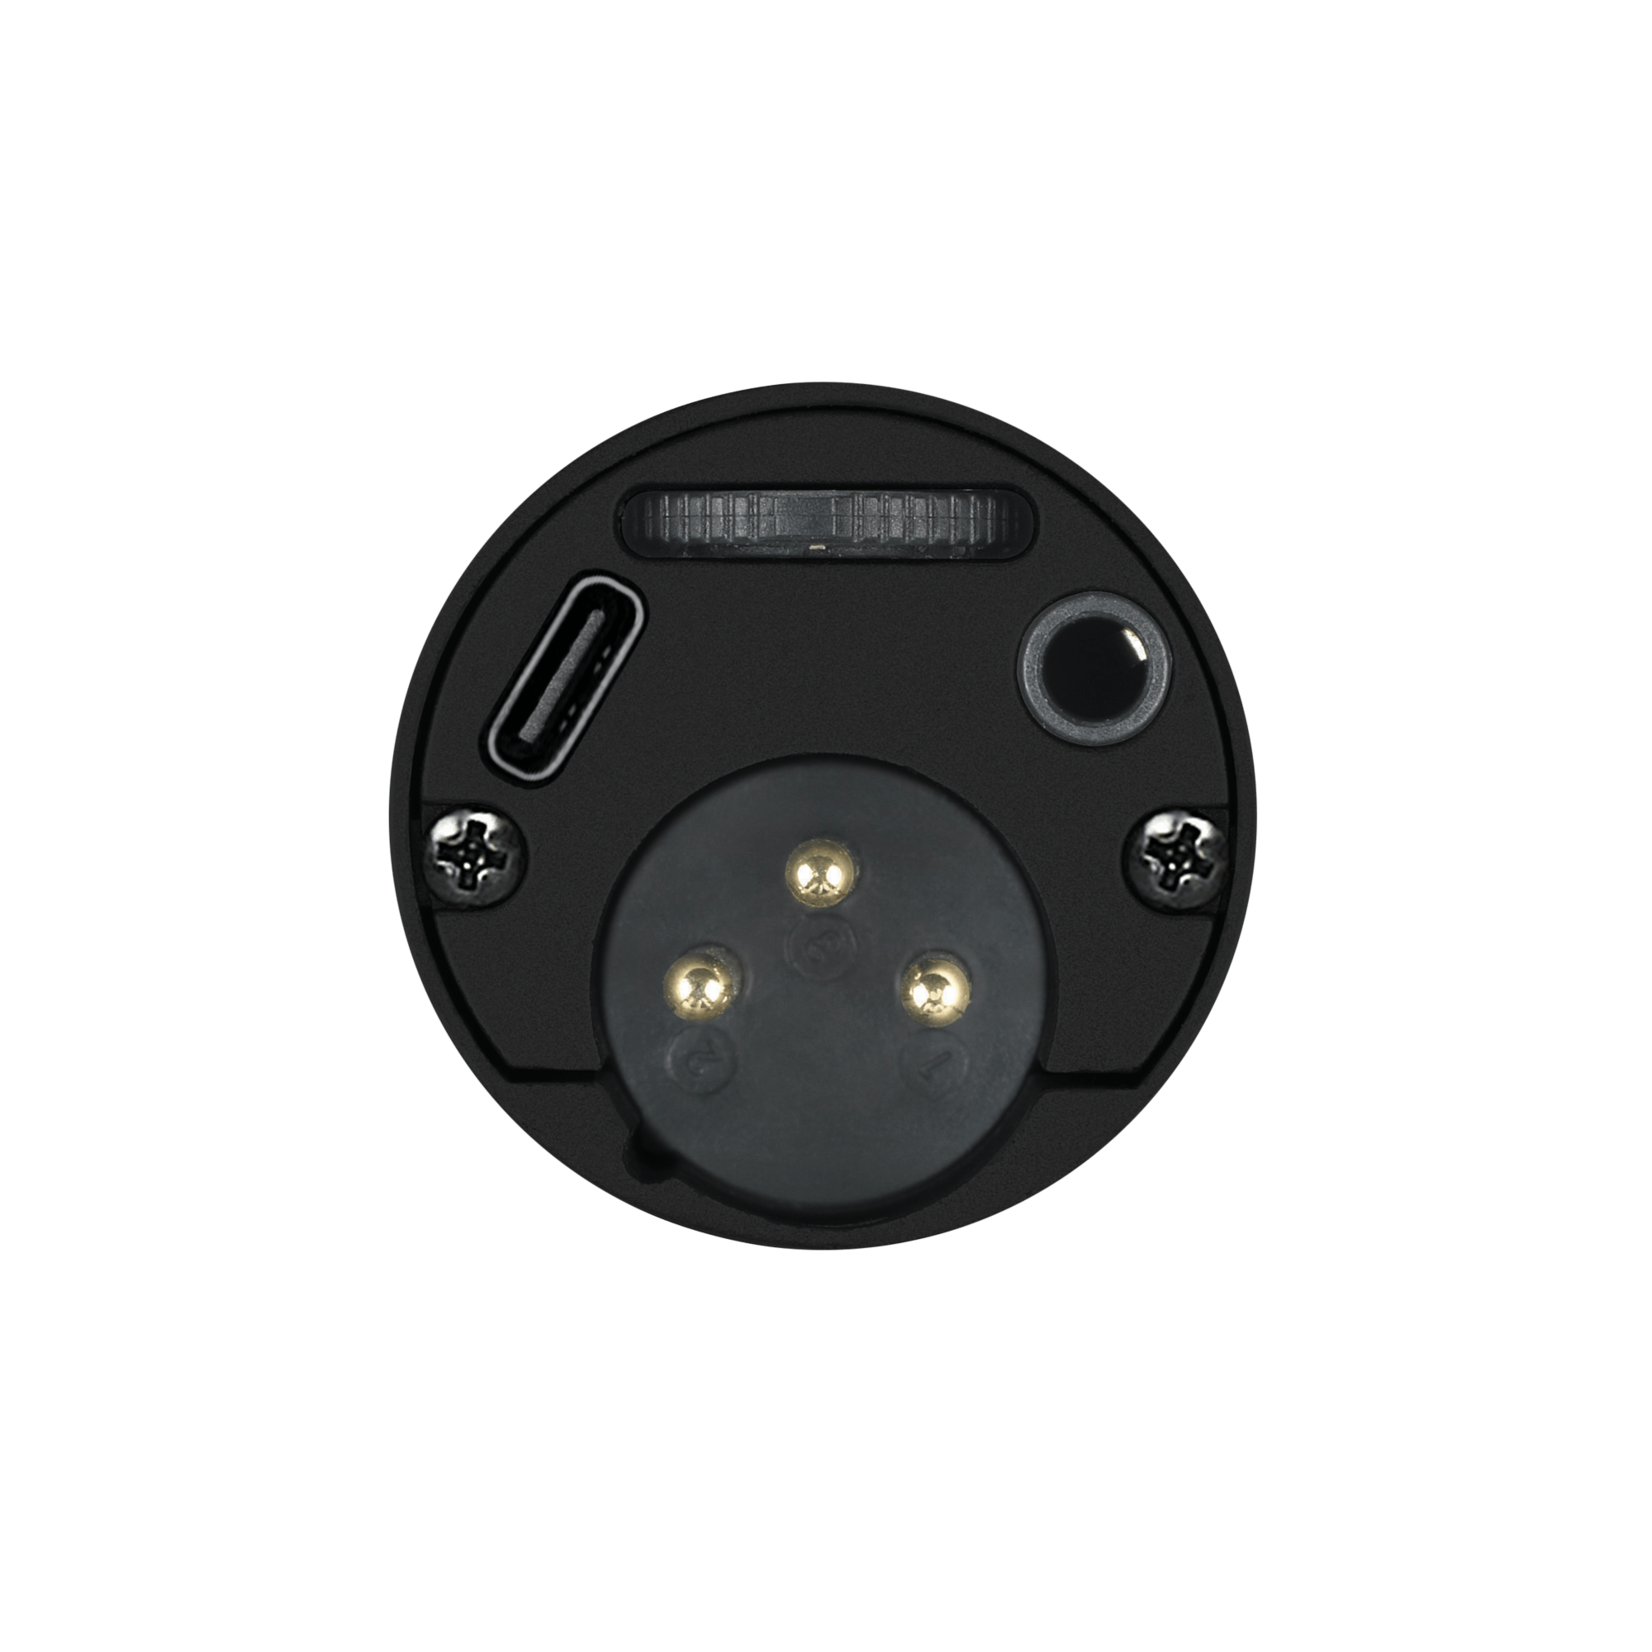 AUDIO-TECHNICA ATR2100X-USB  STREAMING / PODCASTING MICROPHONE